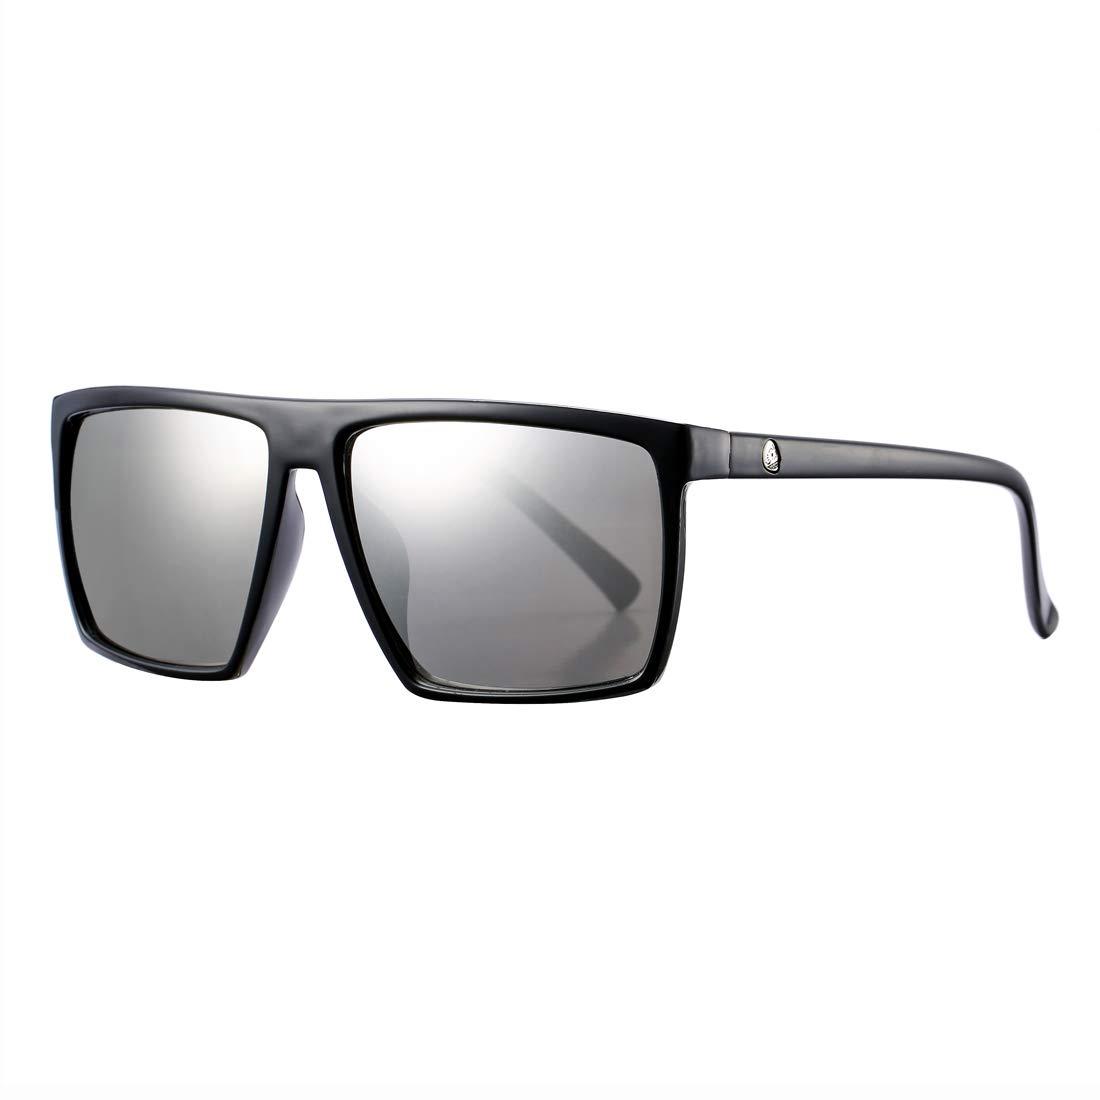 da96cda665 Amazon.com  Square Sunglasses for Men Women Oversized Retro 100% UV  Protection Black Shades (Black Frame Silver Mirror Lens)  Clothing